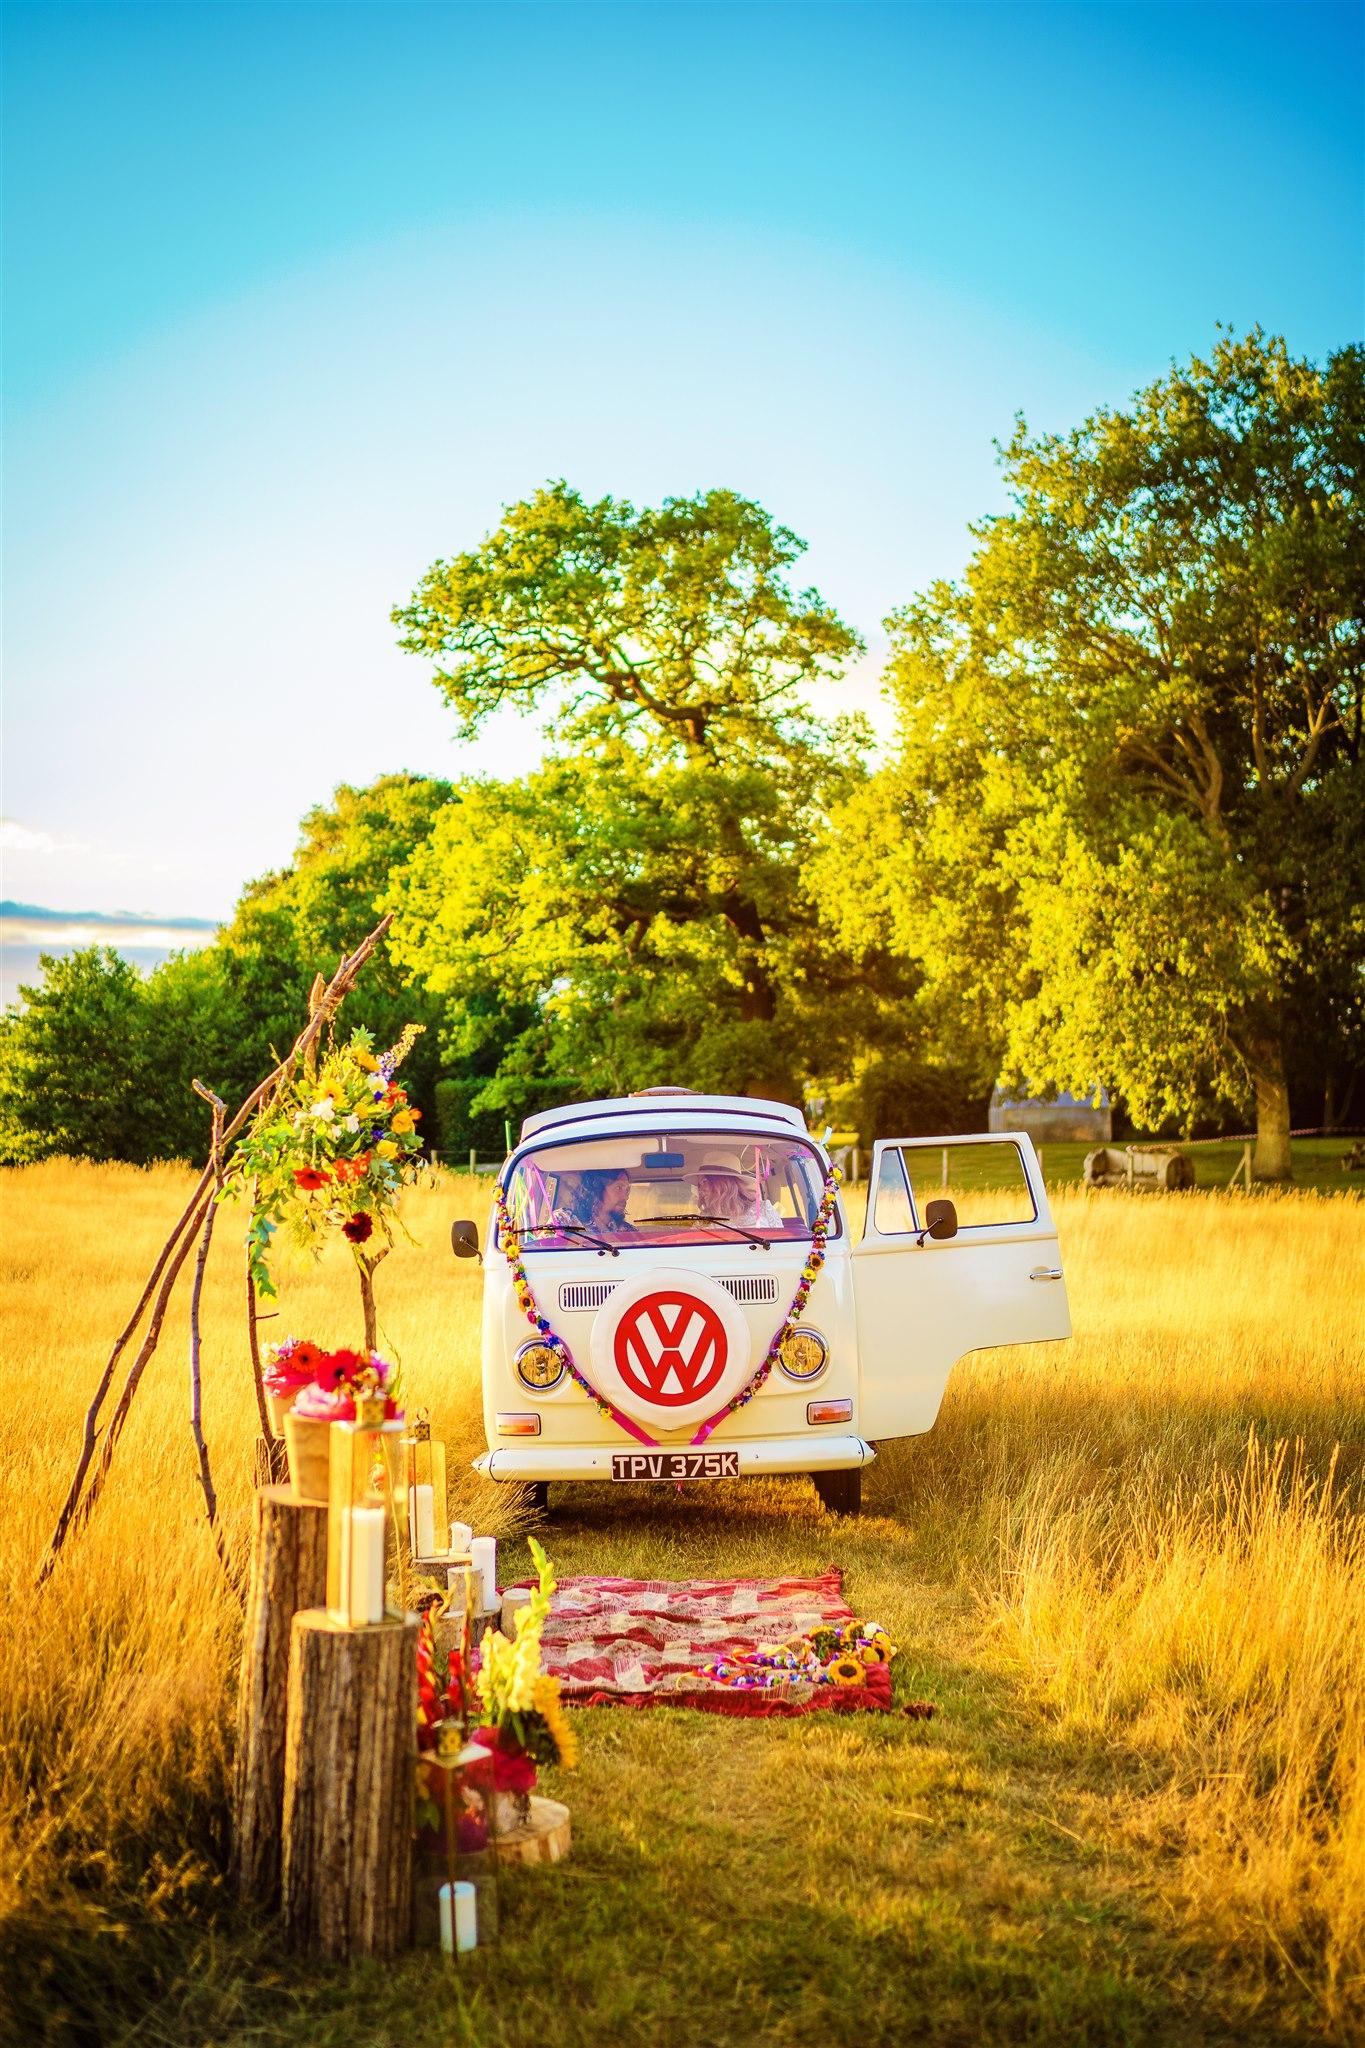 colourful bohemian wedding - 70s wedding - campervan wedding - hippie wedding - unique wedding transport - wedding camper van photobooth